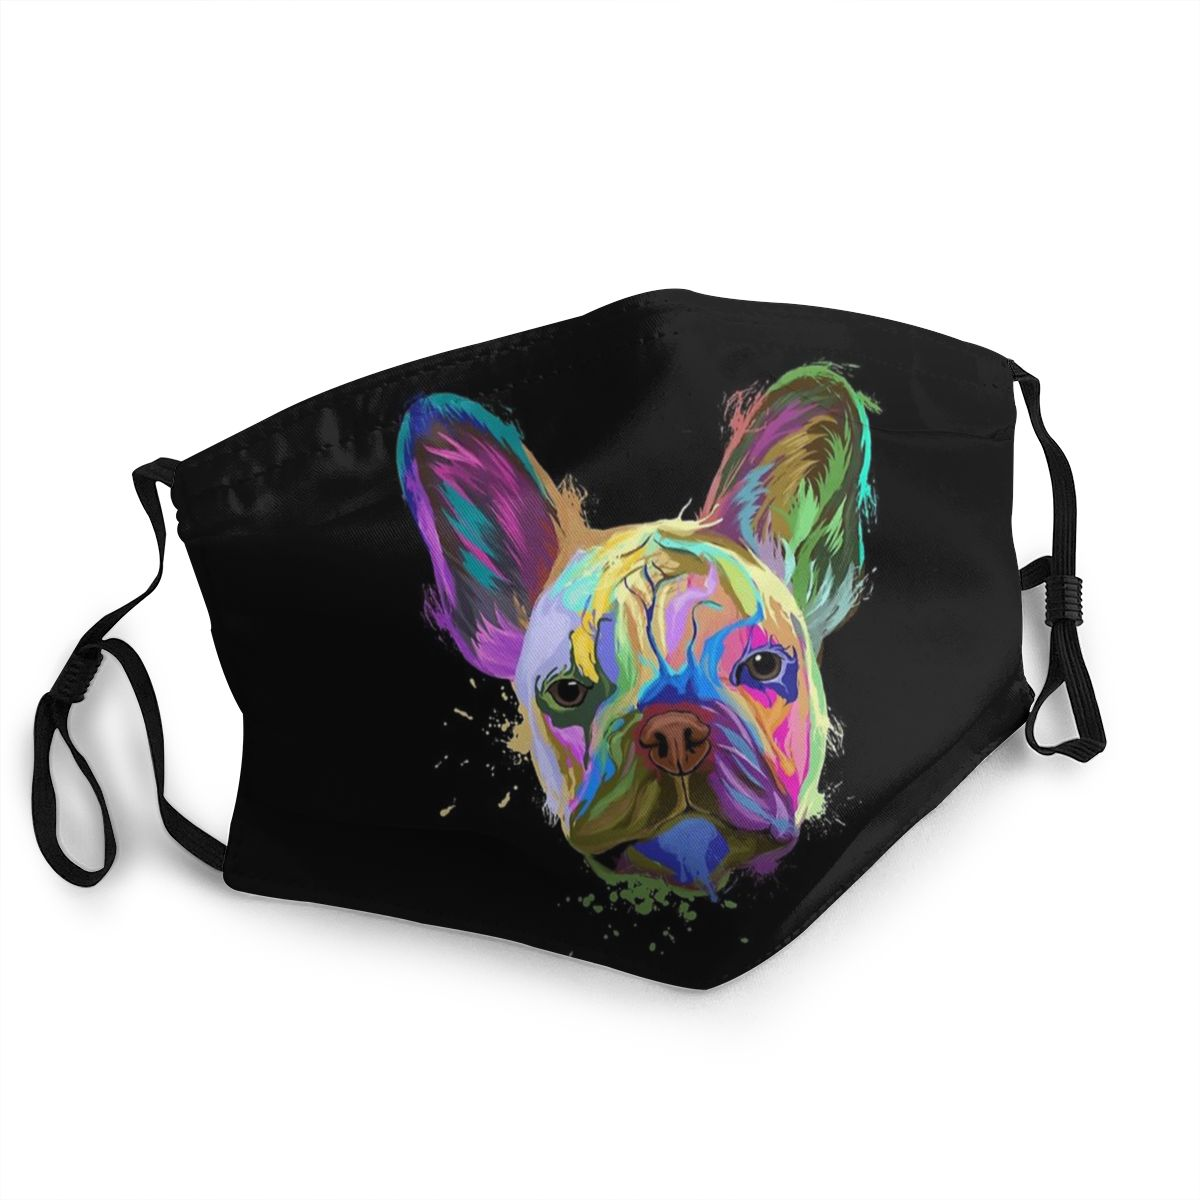 French Bulldog Adult Reusable Face Mask Dog Animal Pet Puppy Anti Haze Dustproof Protection Cover Respirator